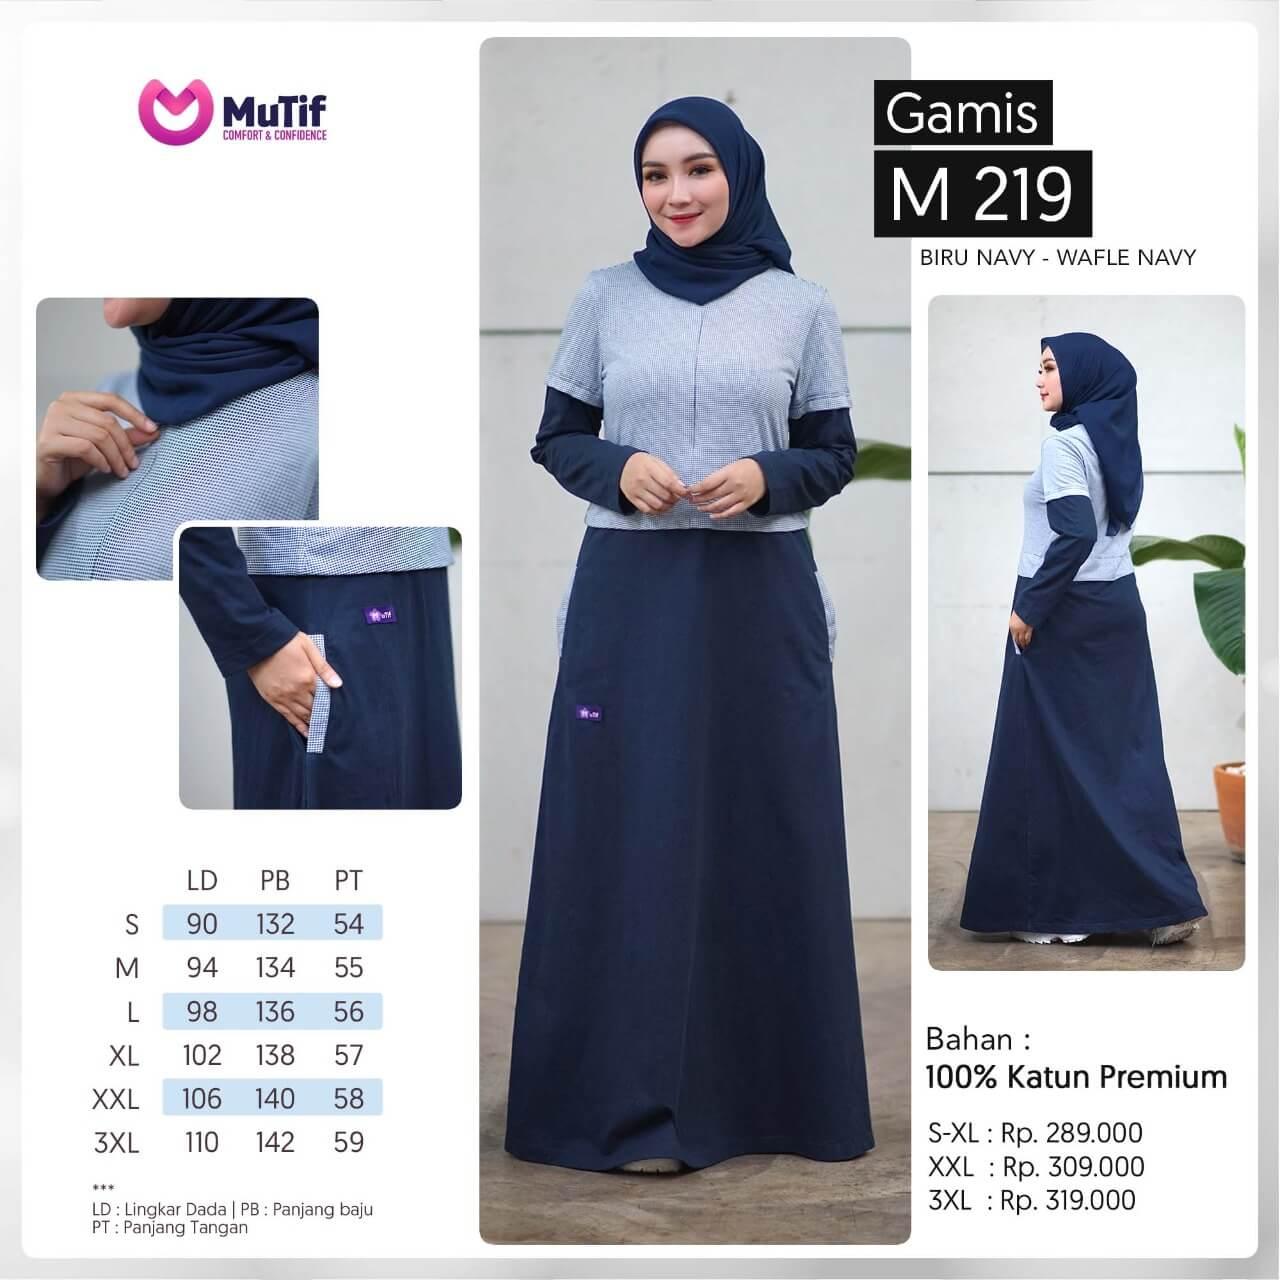 Baju Wanita Gamis Mutif Terbaru Dan Trendy 2020 Mtif 219 A Biru Navy Wafle Navy Lazada Indonesia